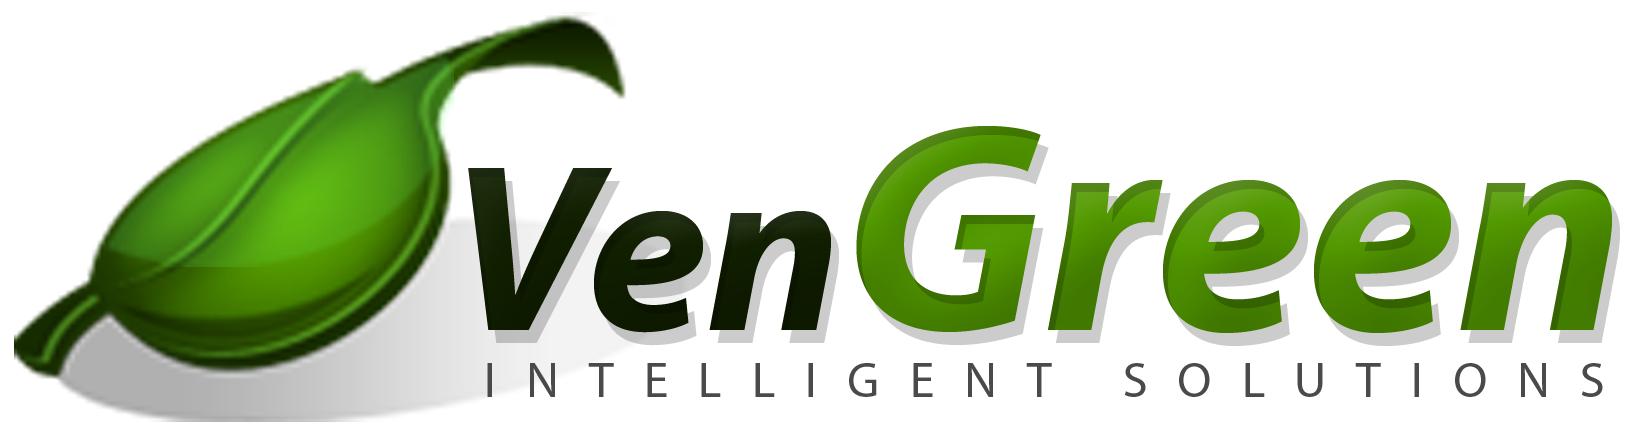 Vengreen Solutions Logo